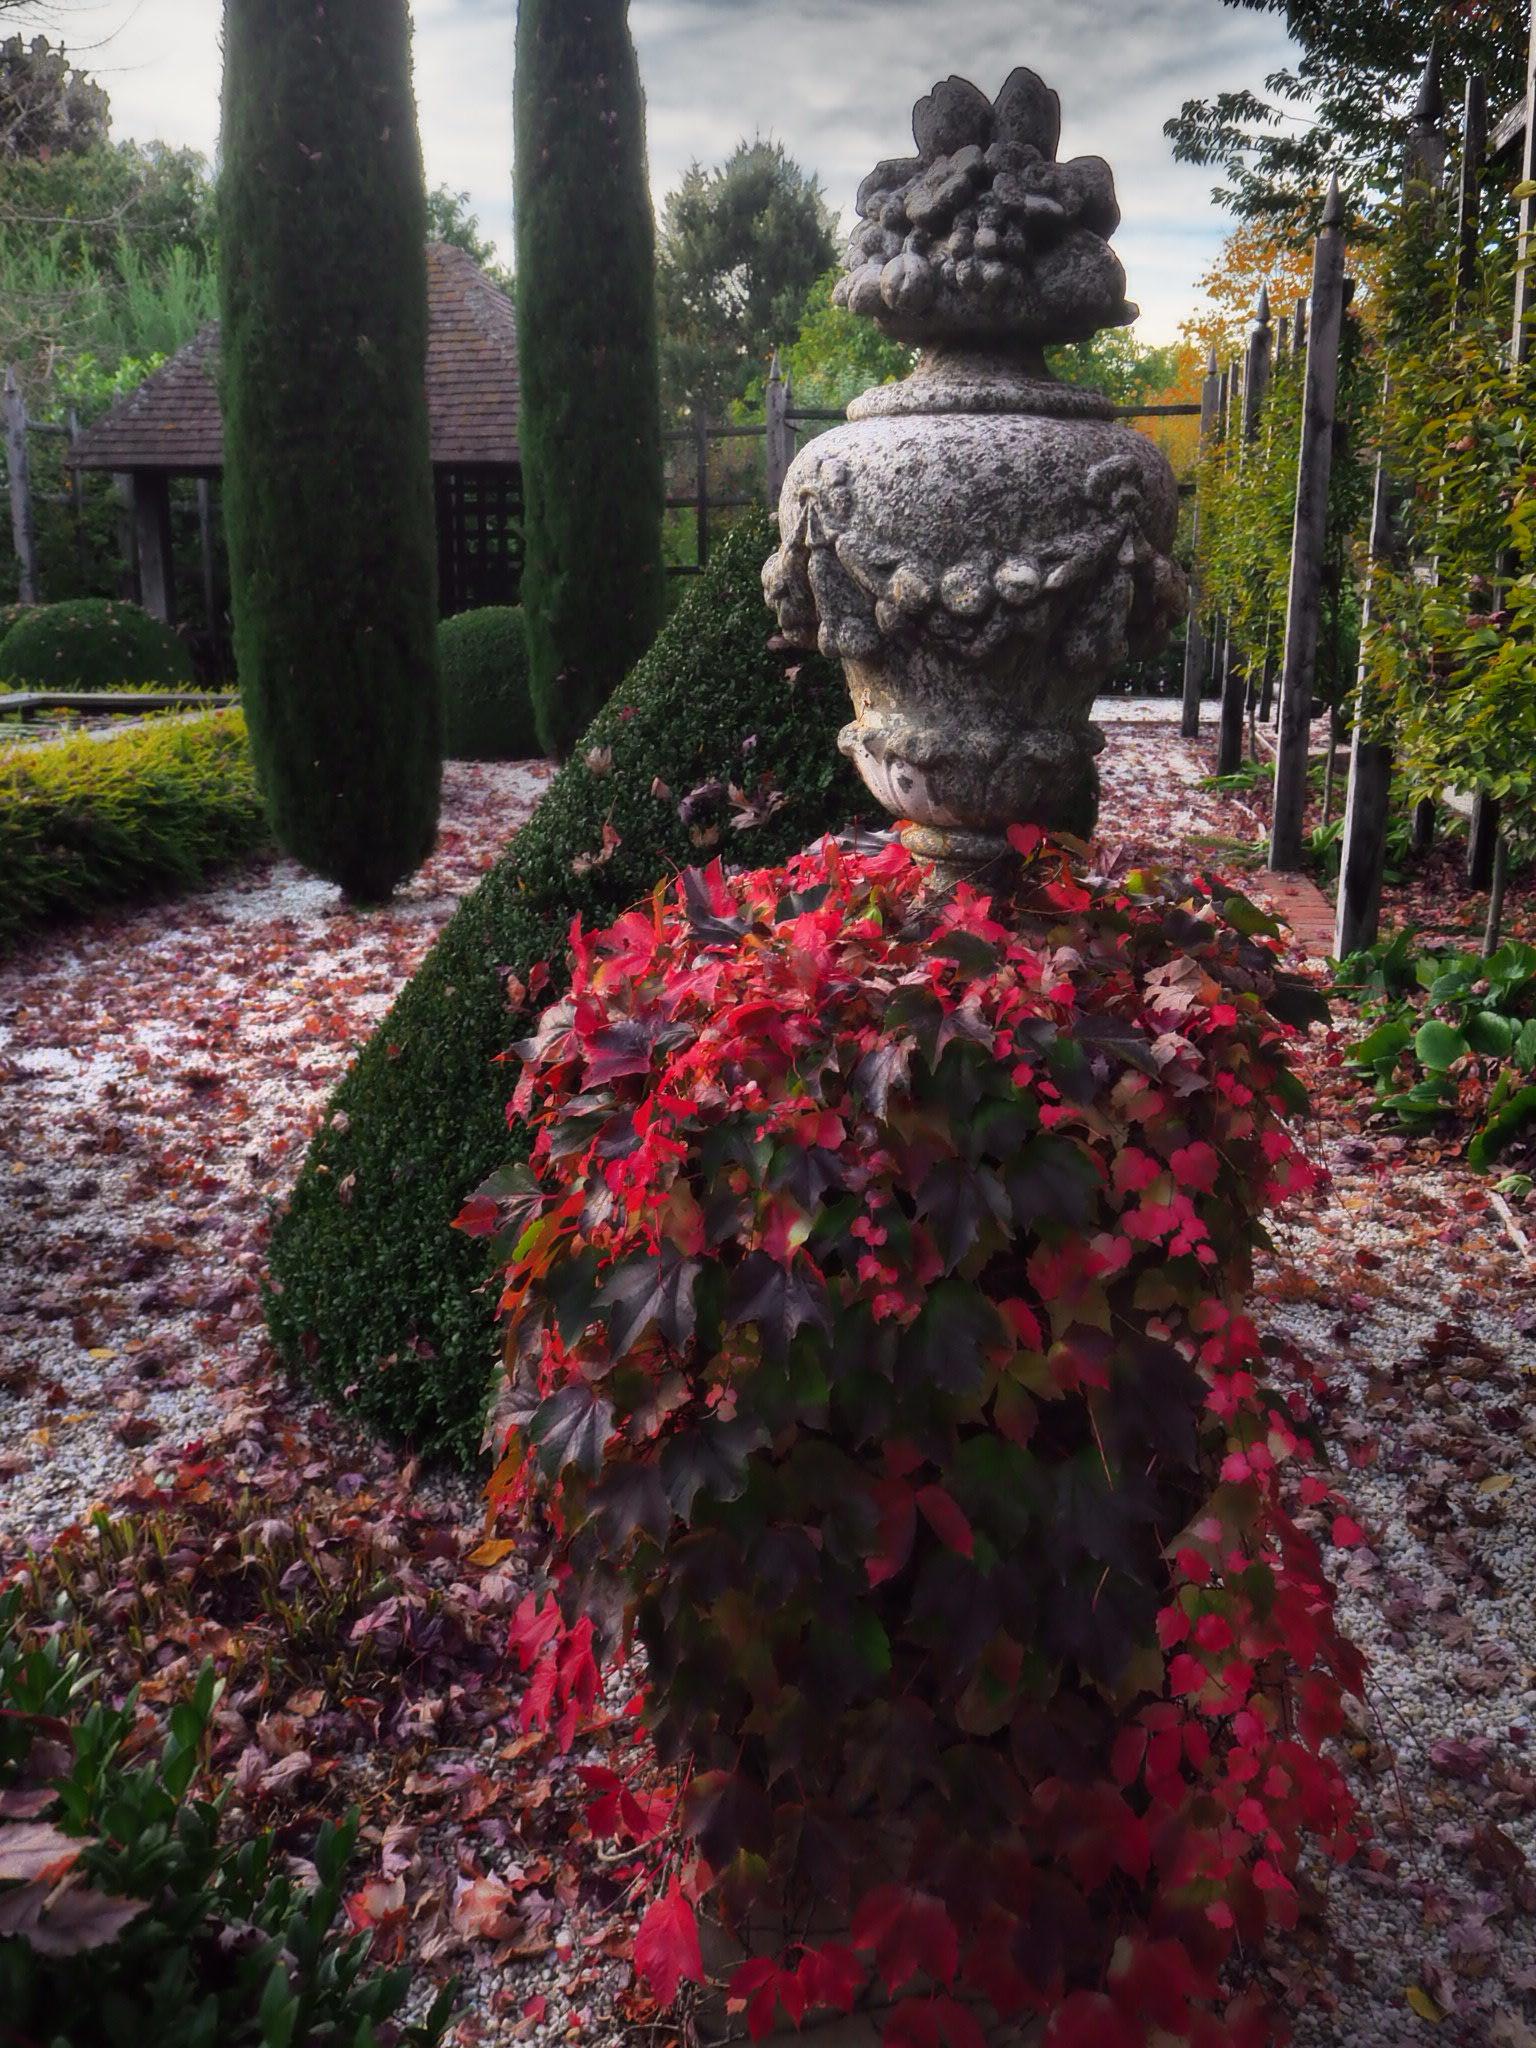 muskfarm_autumn_vines_englis_IMG_3484.JPG